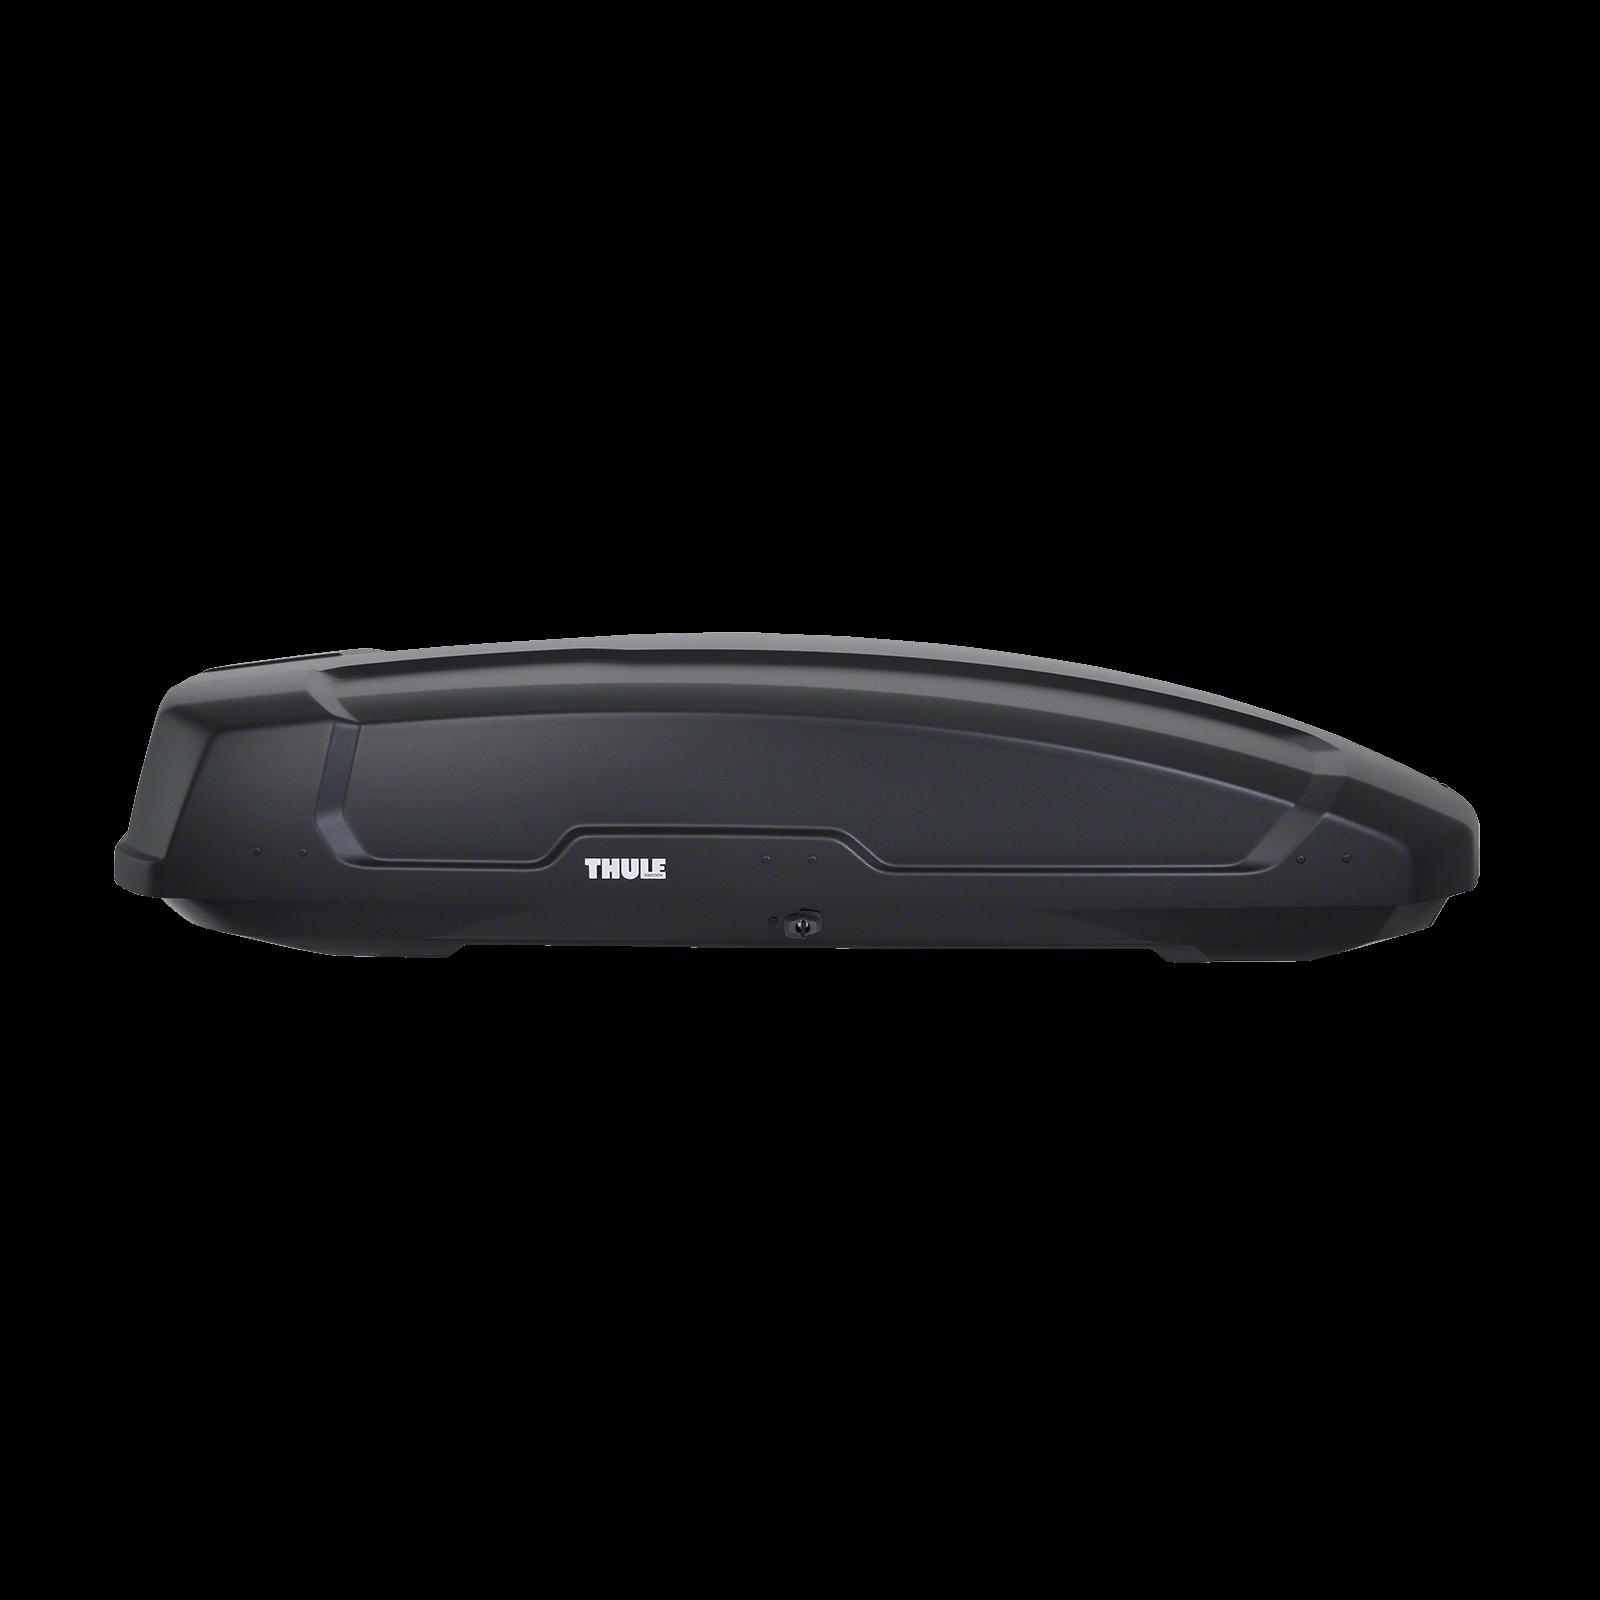 Dachbox Thule Force XT XL Black Matte - Bild 4